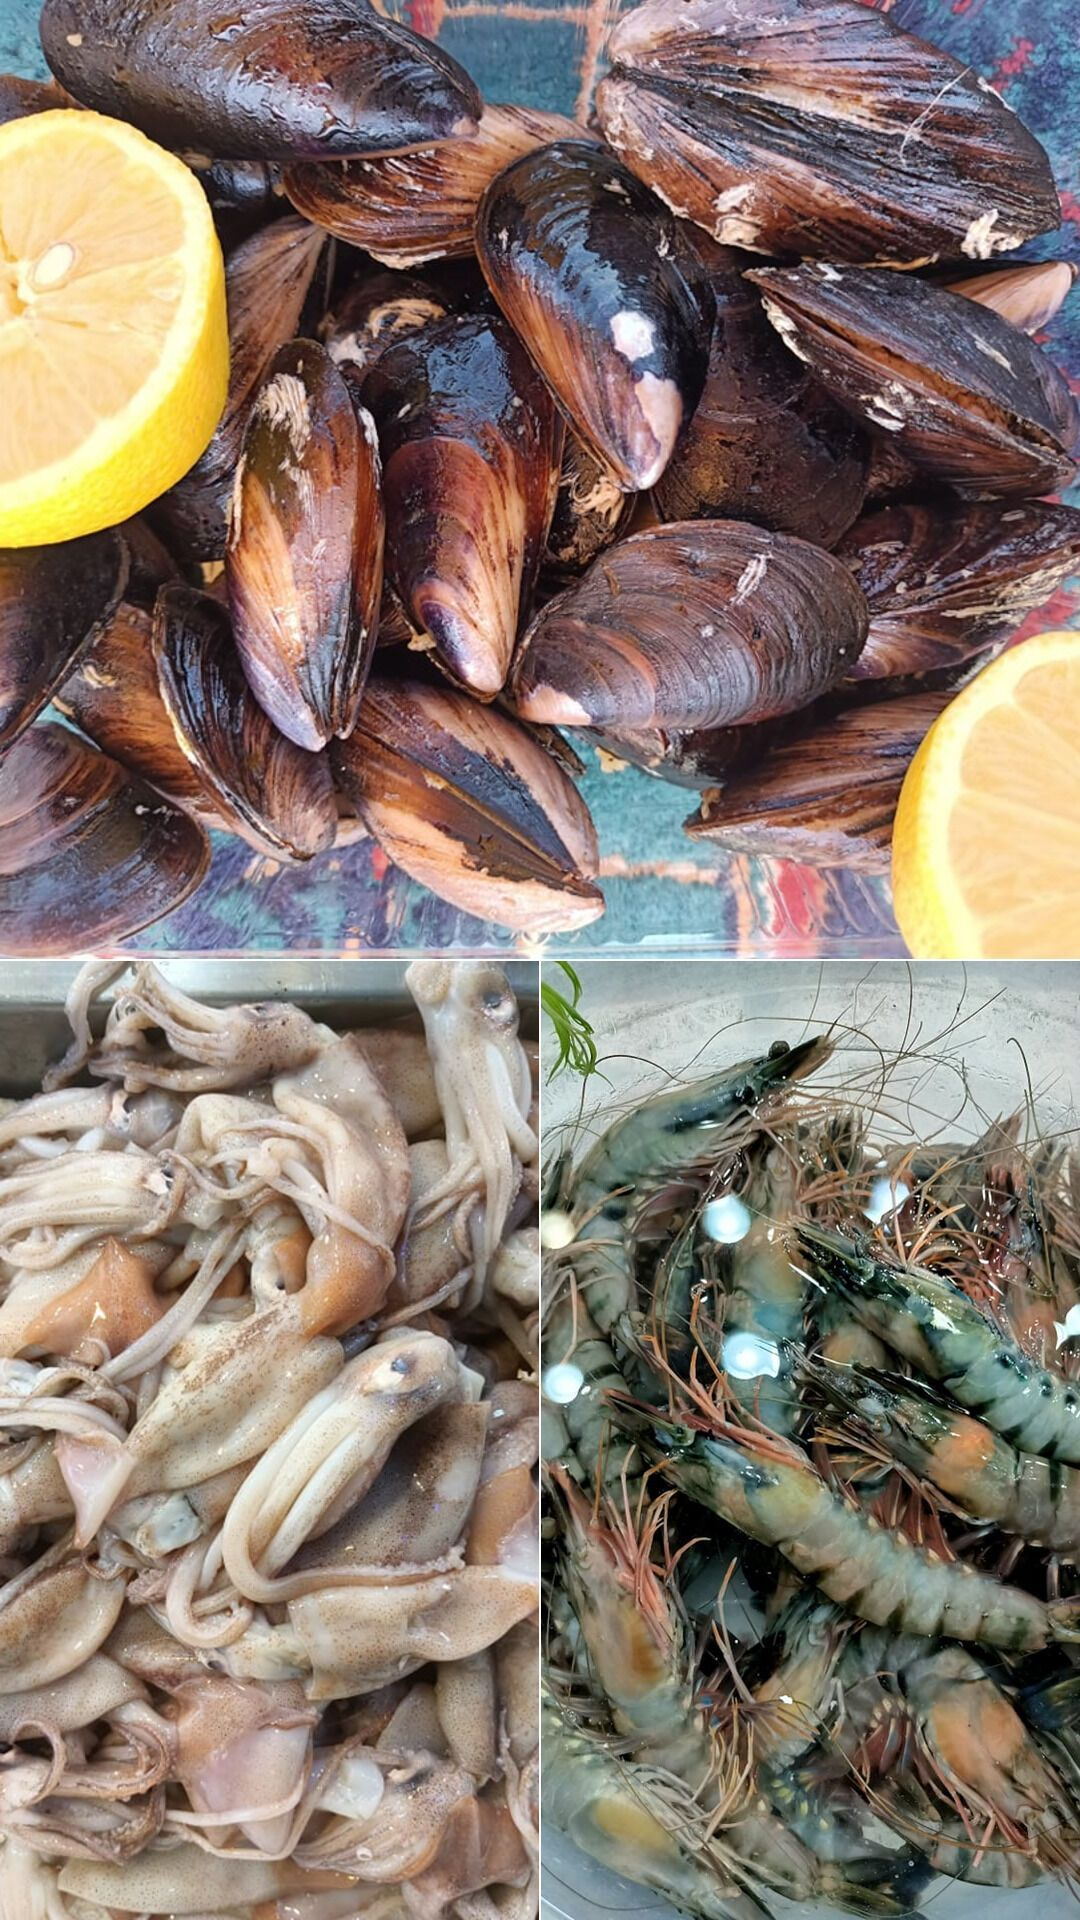 На местном рыбном рынке все самое свежее.